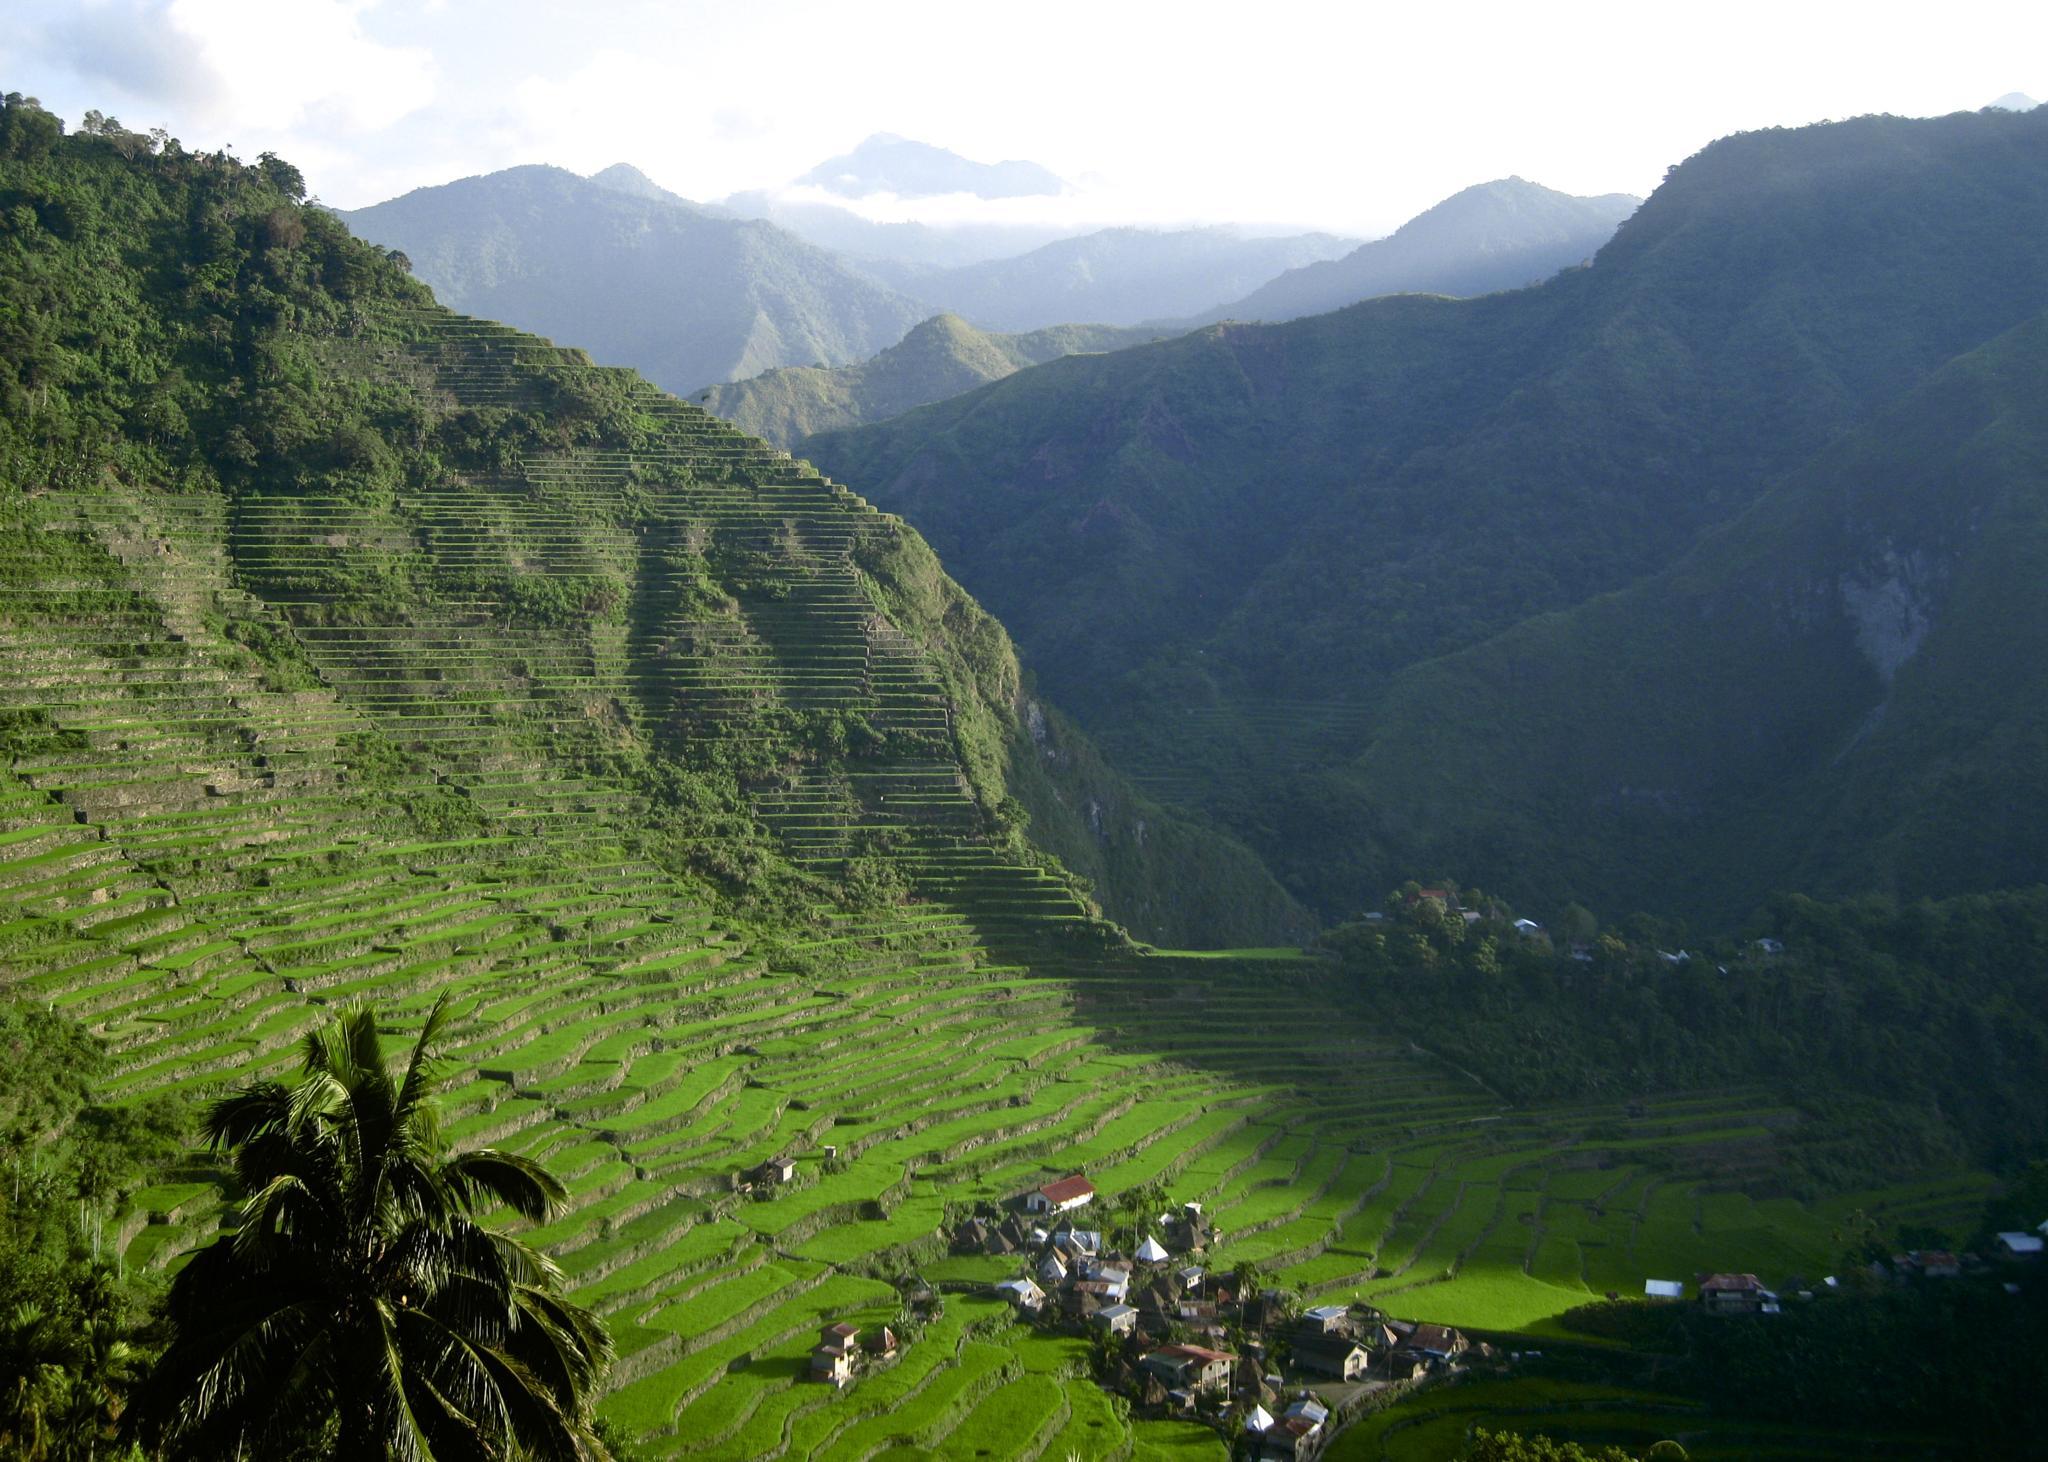 Banaue Rice Terraces by rebecca.mayoll